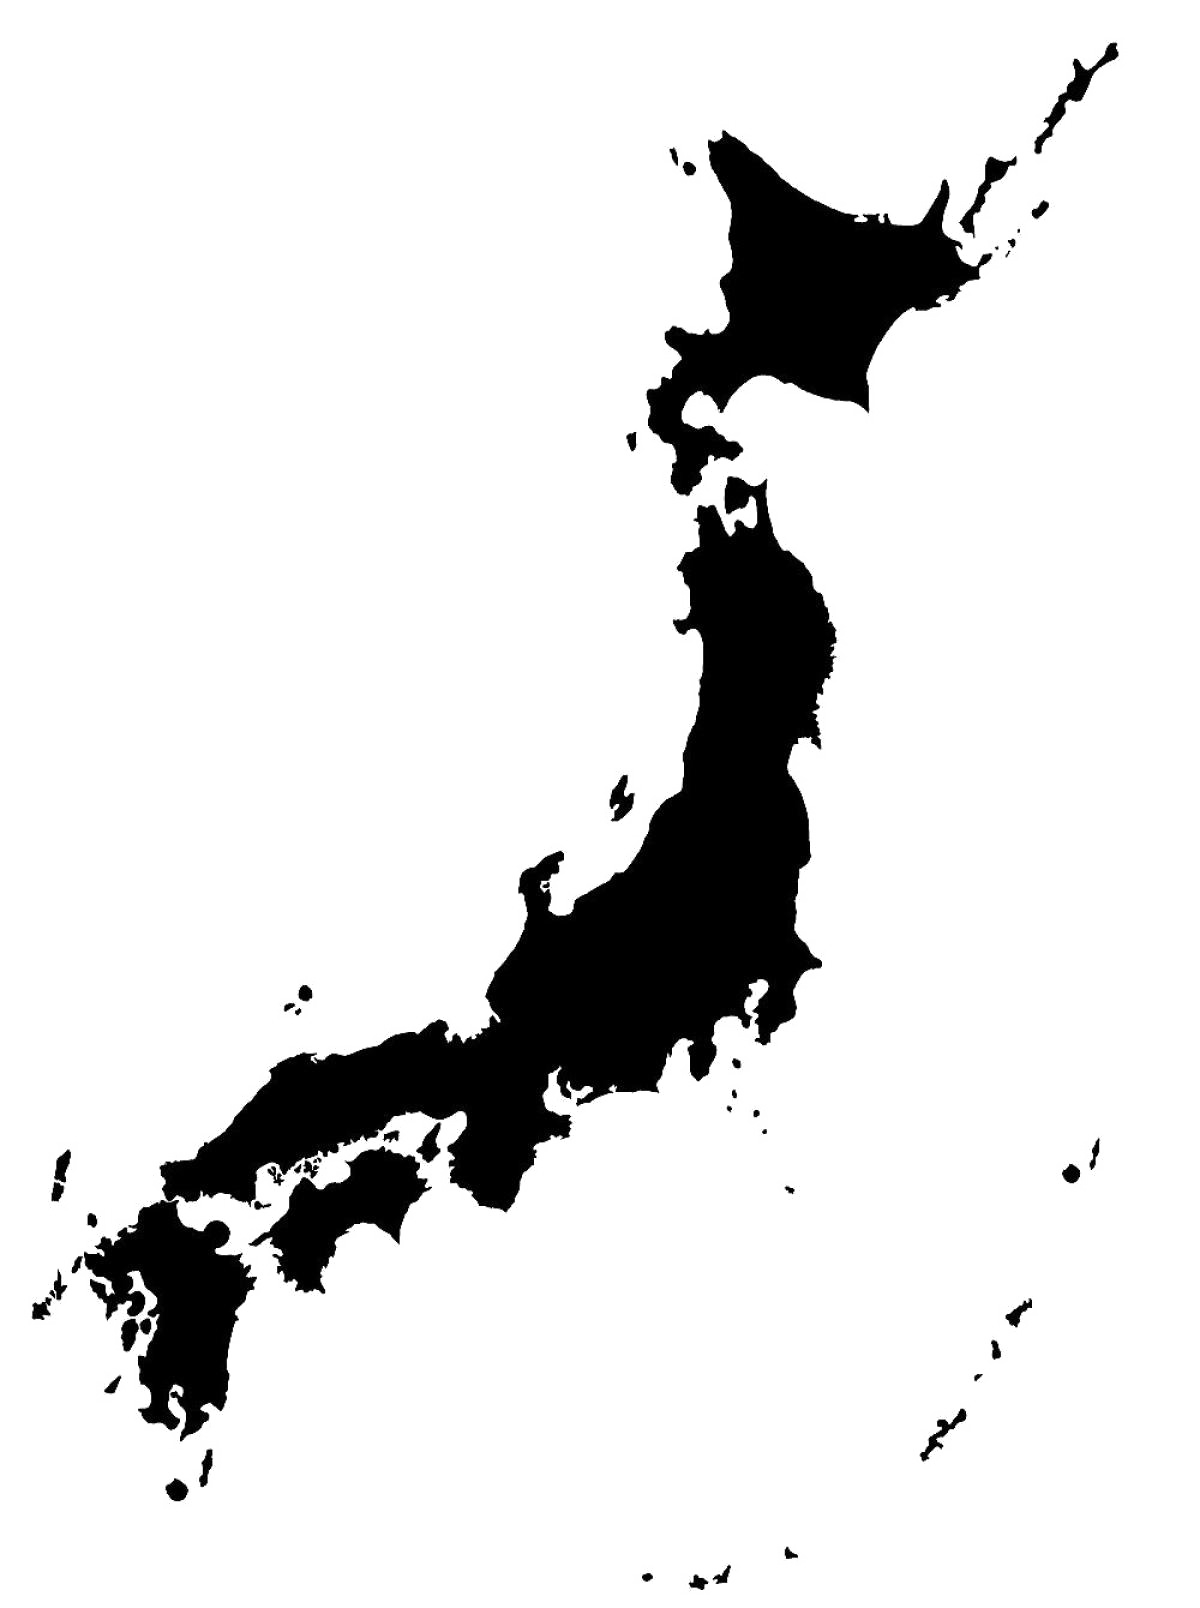 Japanese clipart map japan. Png transparent image mart